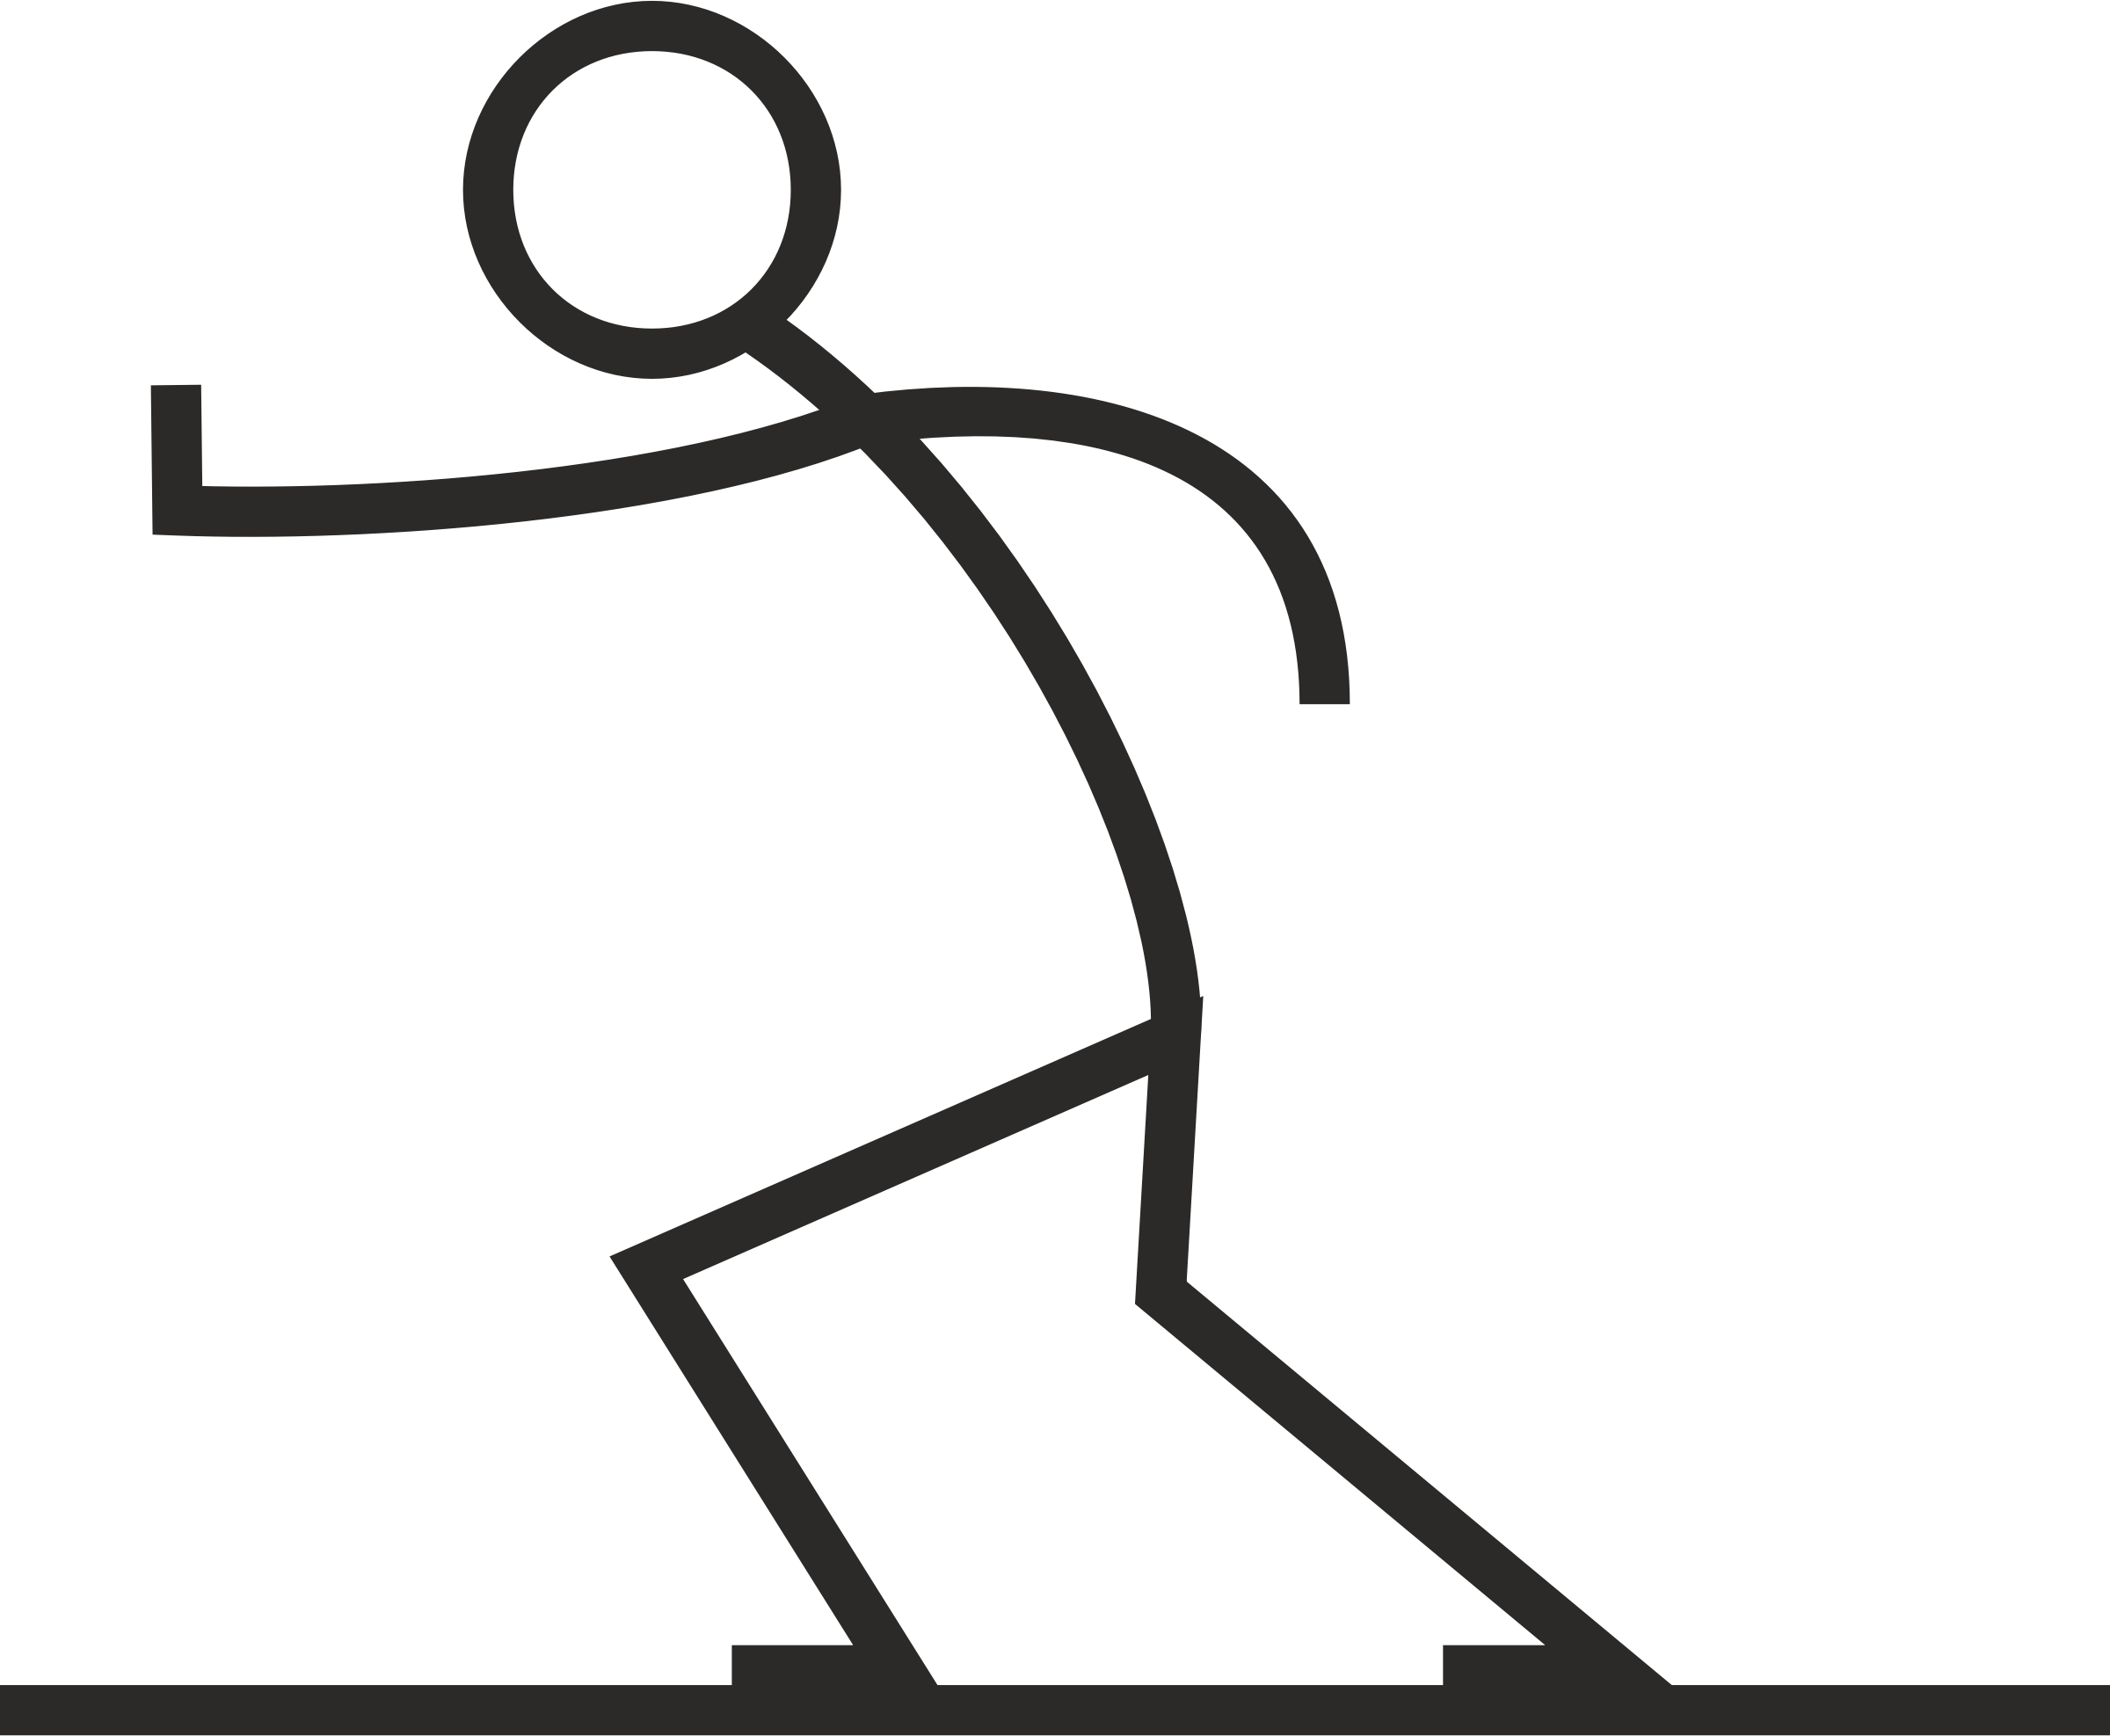 2400x1975 Stick Person Stick Figure Clip Art Clipart